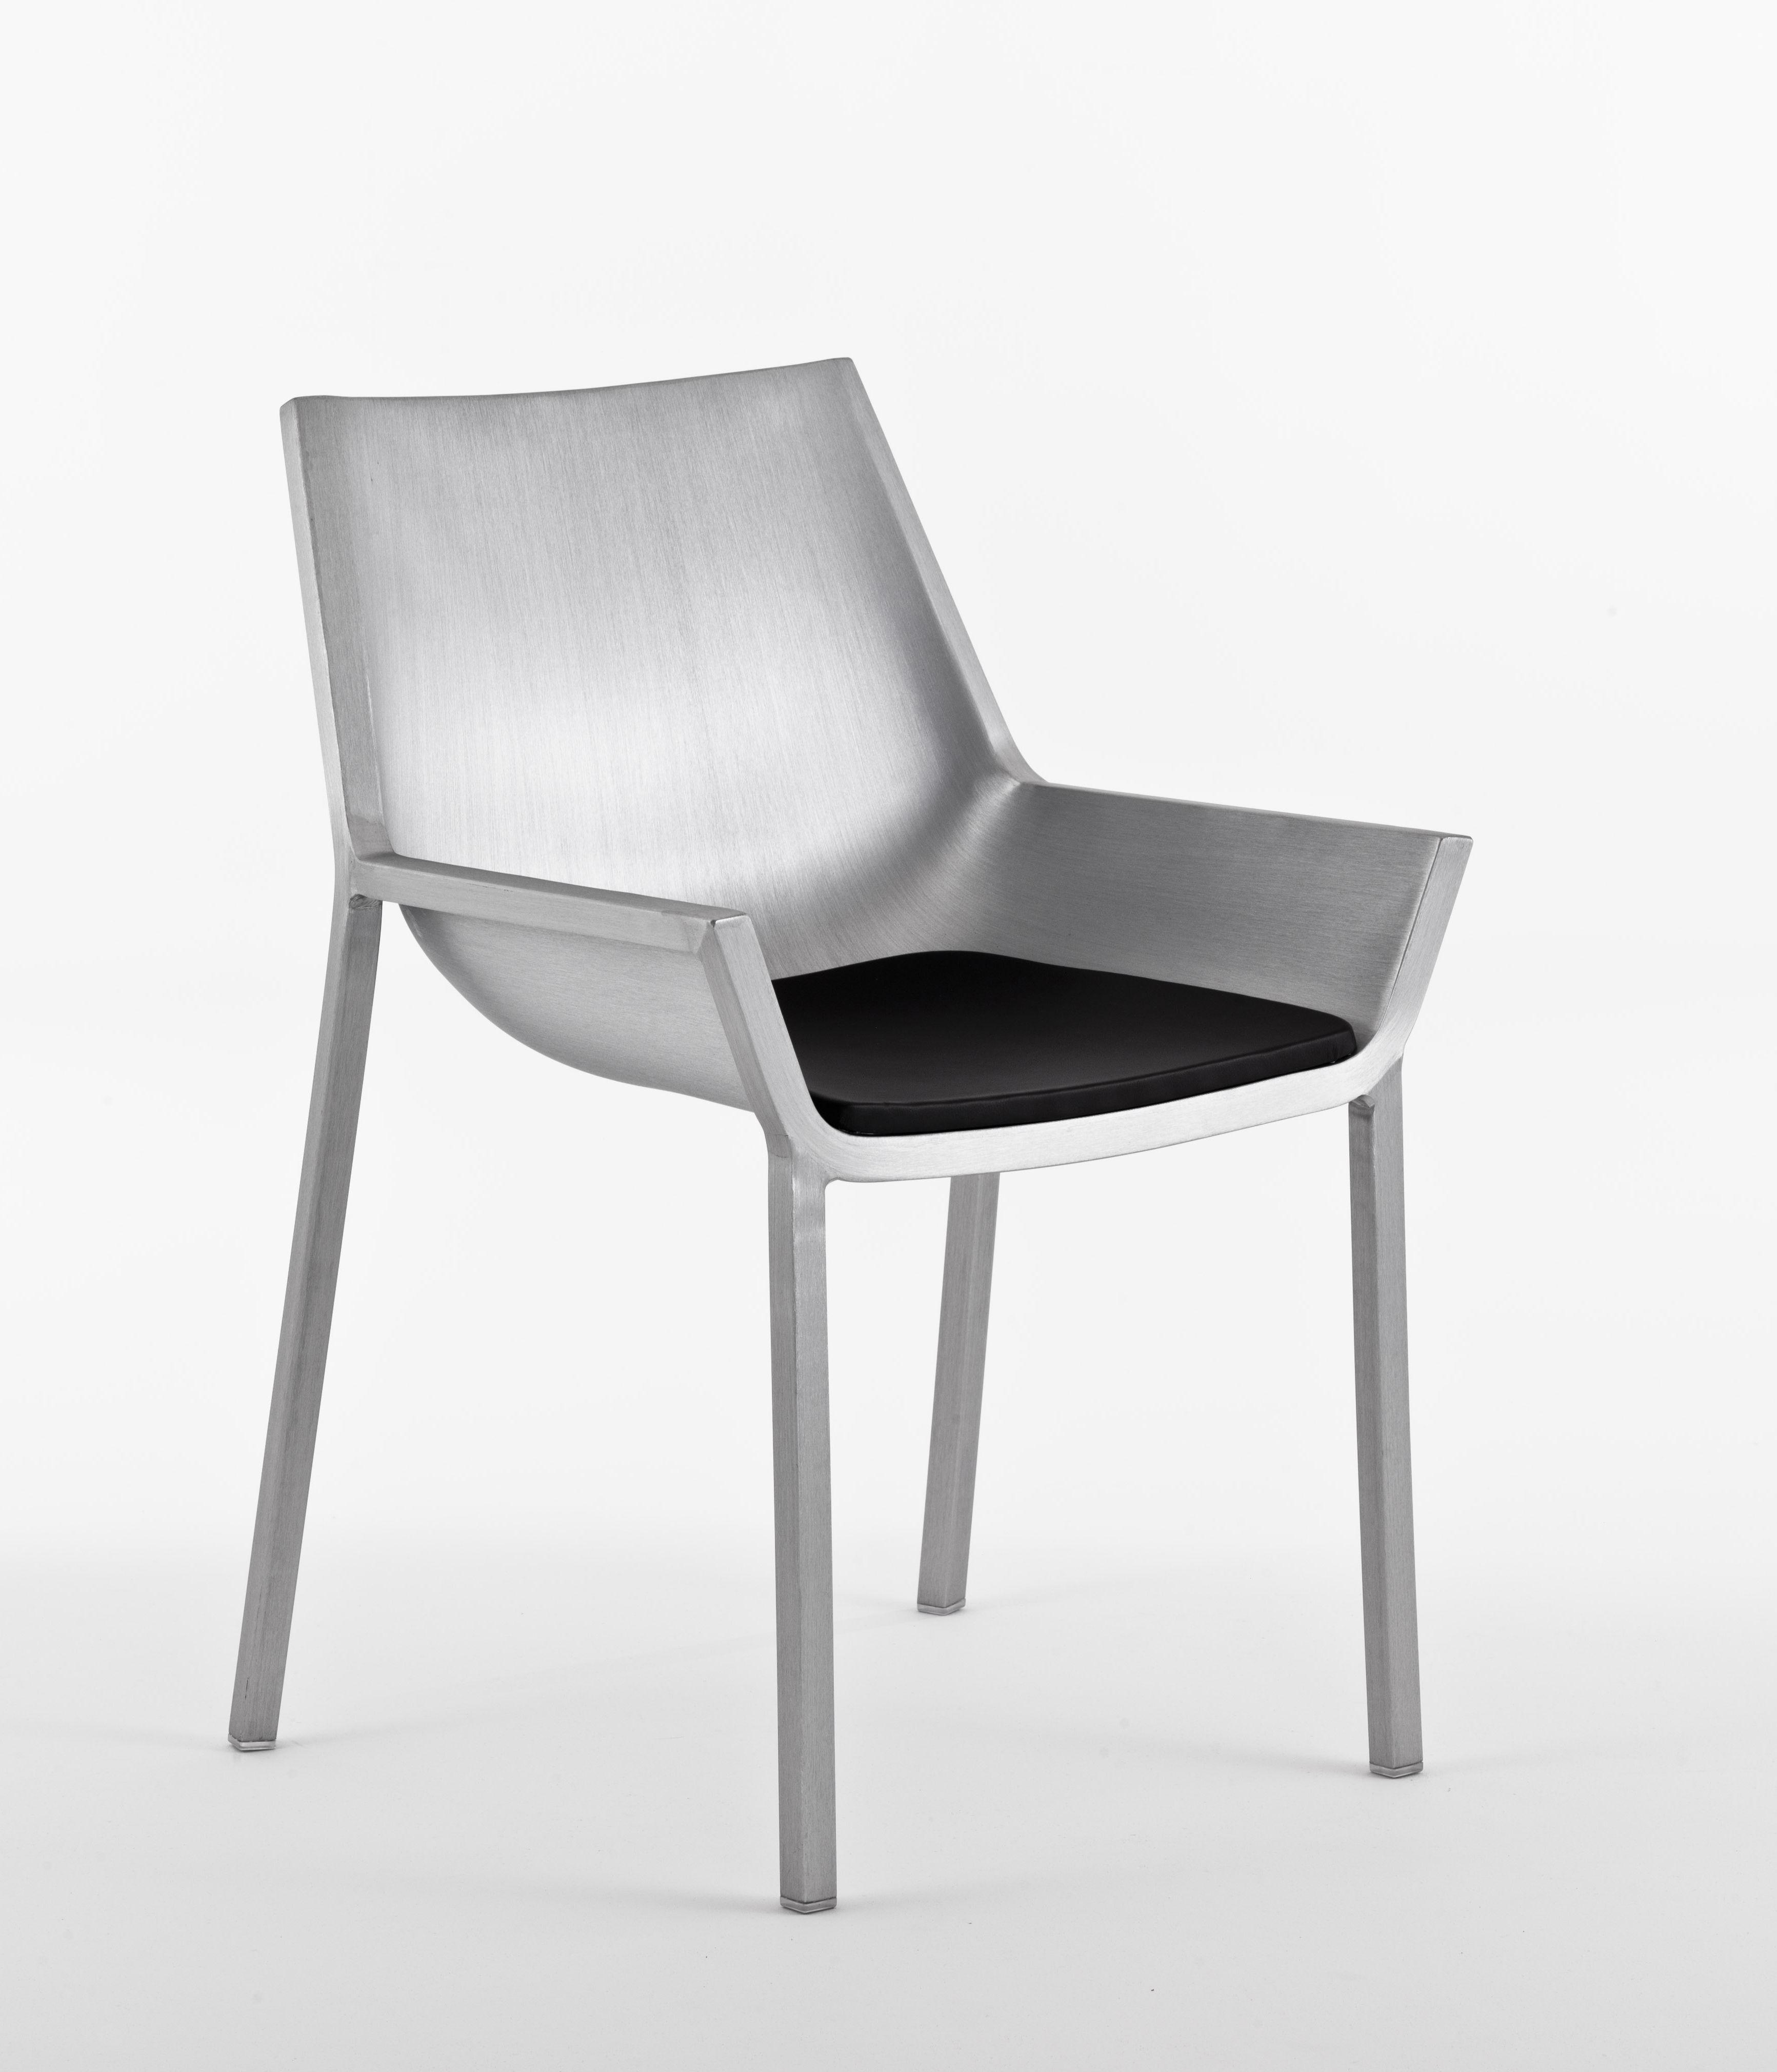 chaise sezz aluminium aluminium bross emeco. Black Bedroom Furniture Sets. Home Design Ideas